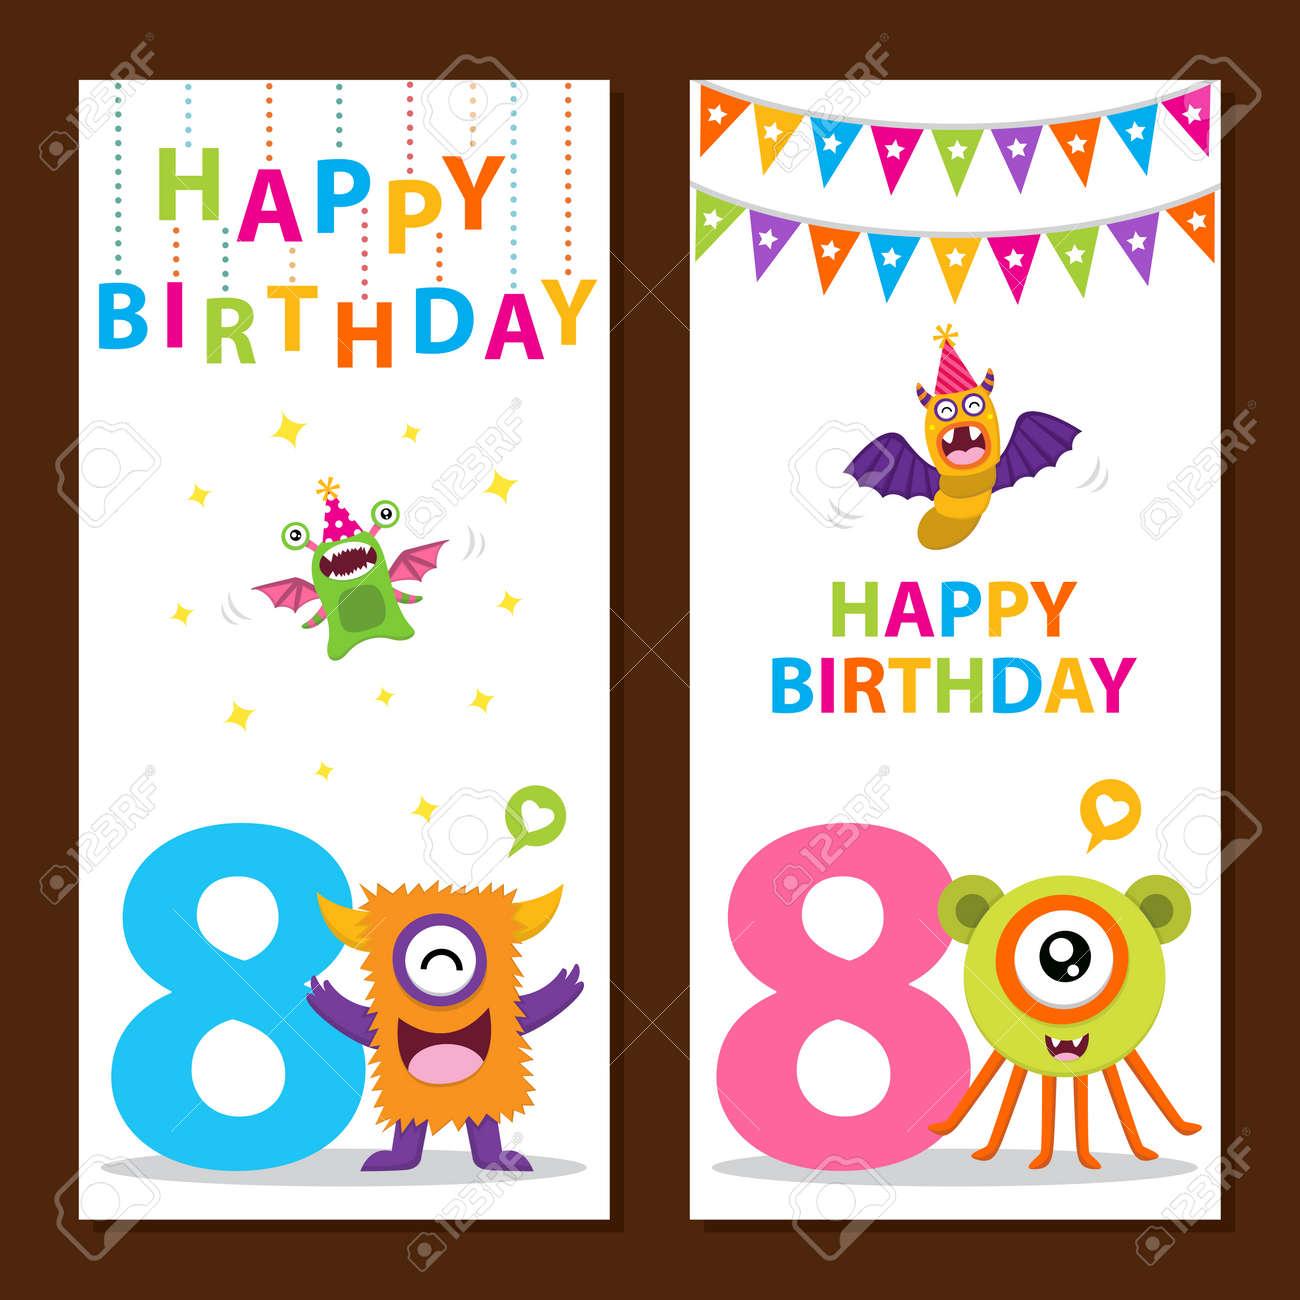 Cute Monster Birthday Card - 58506262